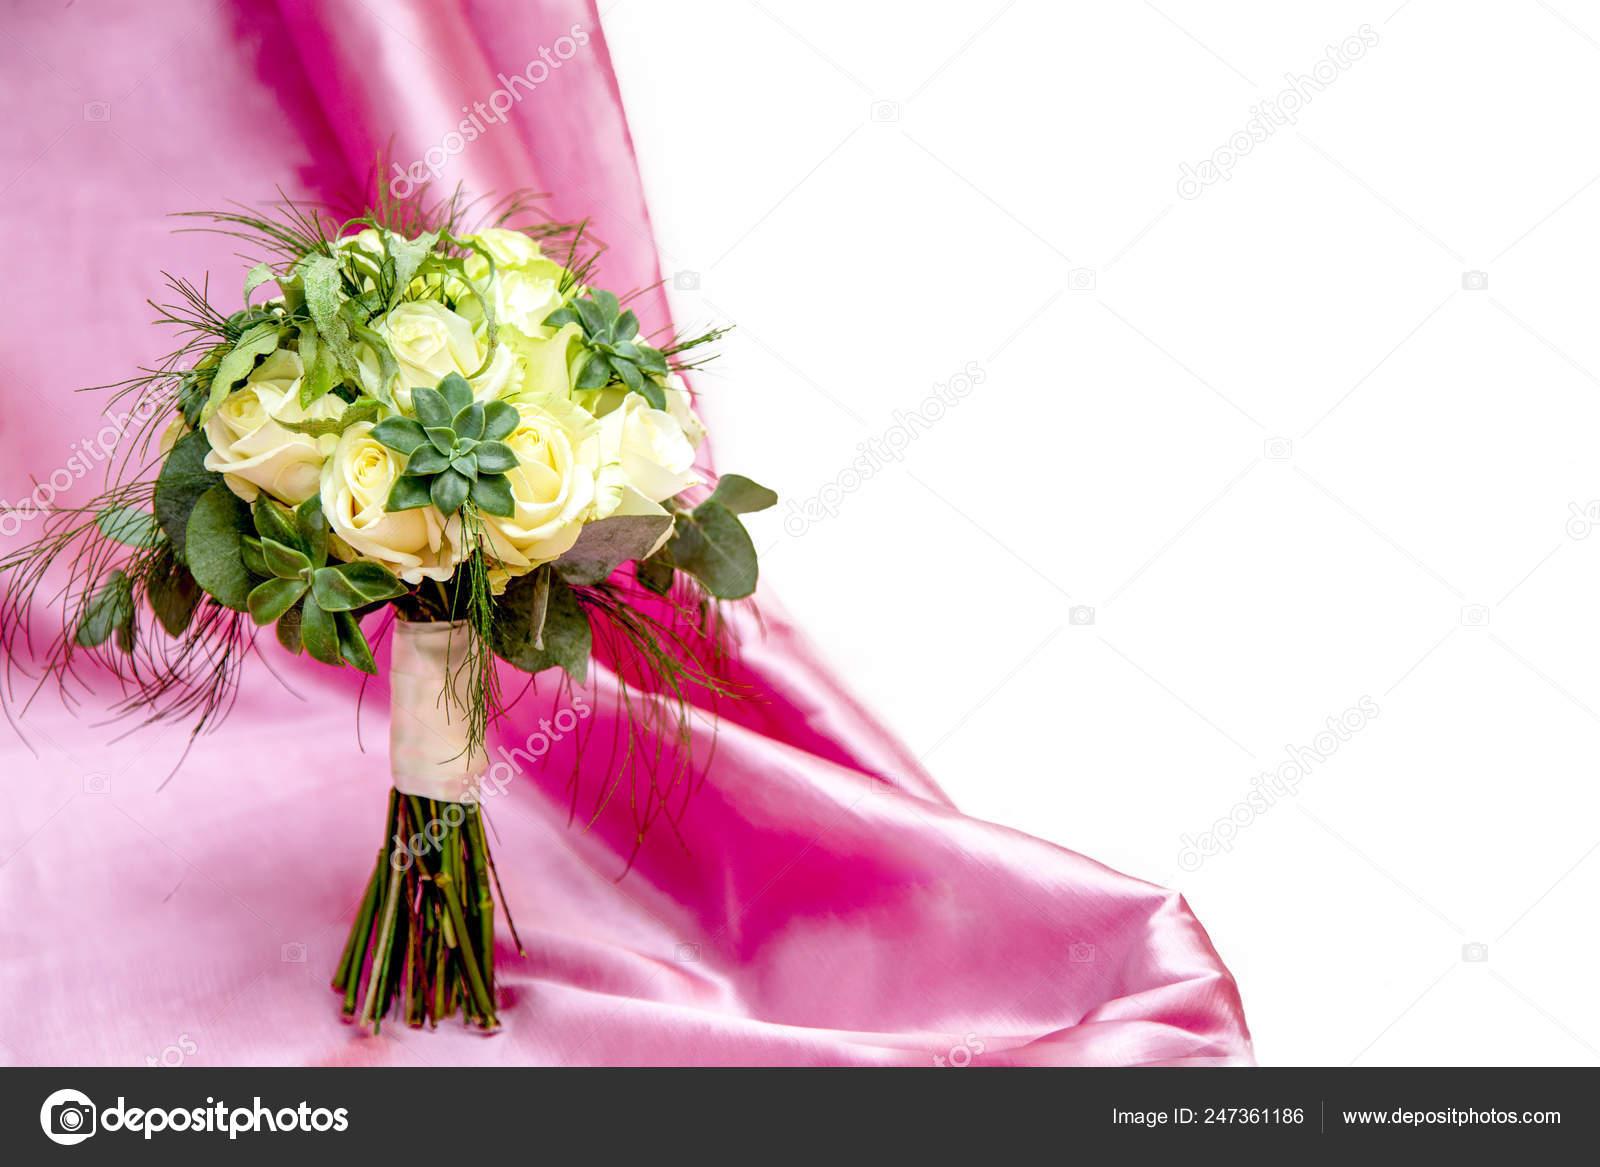 Bouquet White Roses Succulents Background Pink Silk Fabric White Space Stock Photo C Kiyechka 247361186